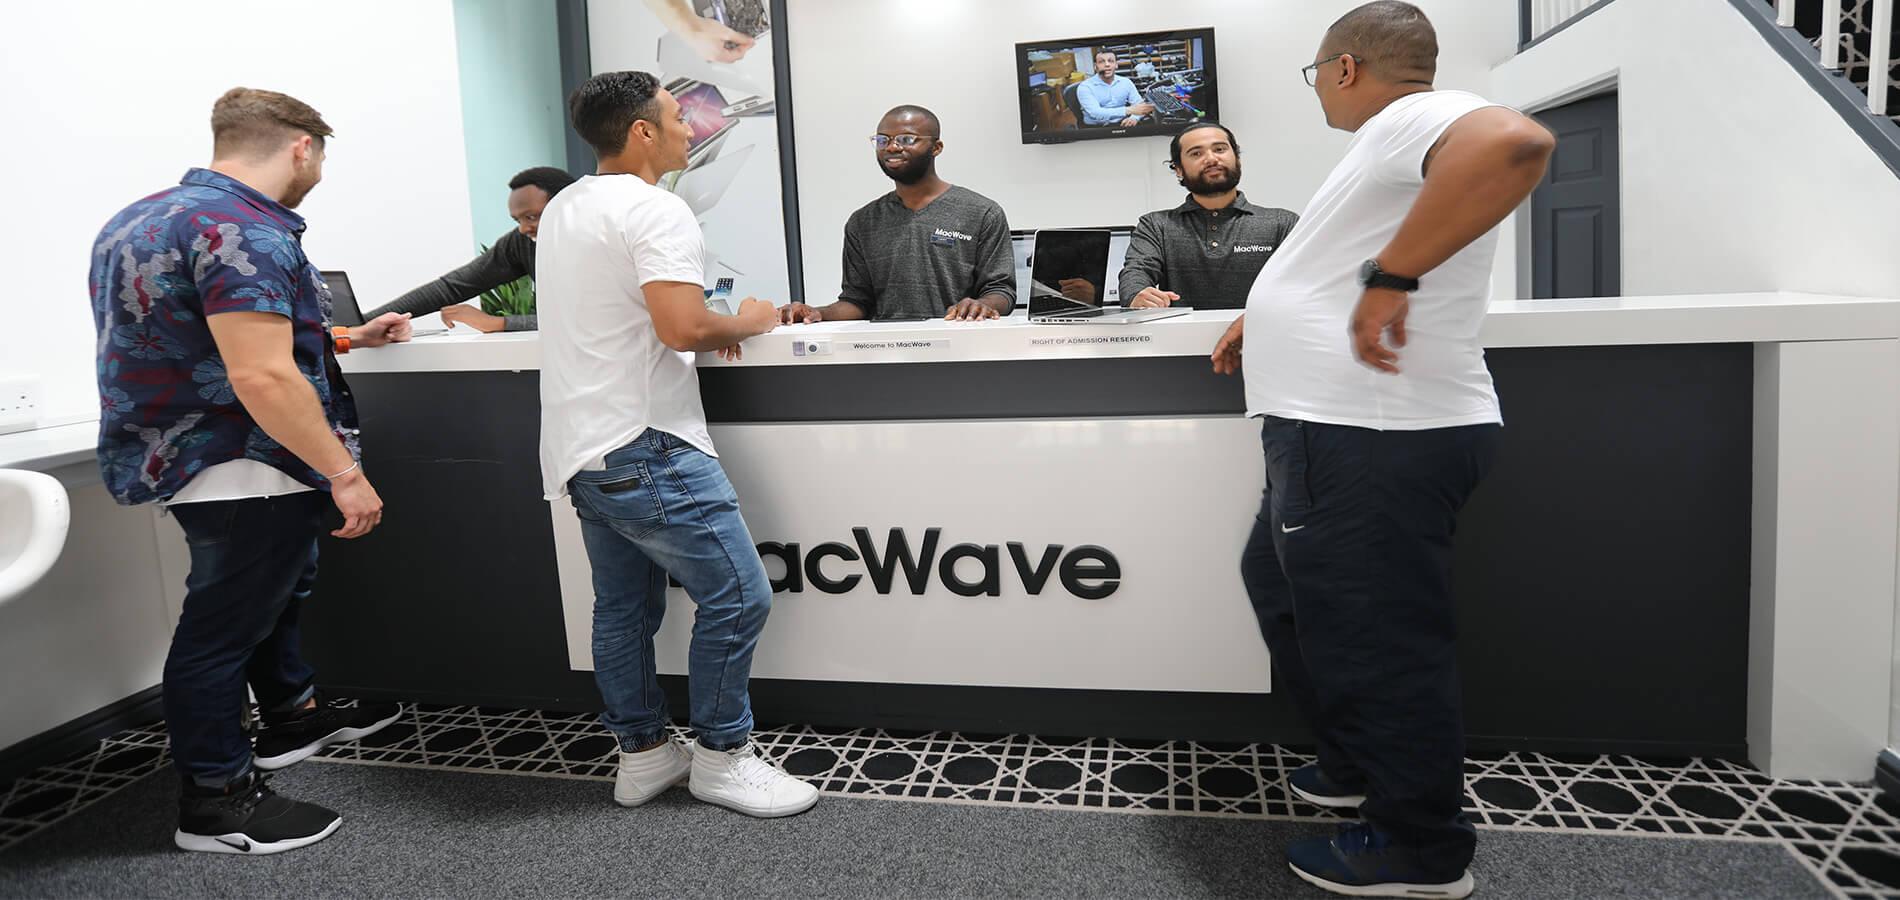 macwave_staff7